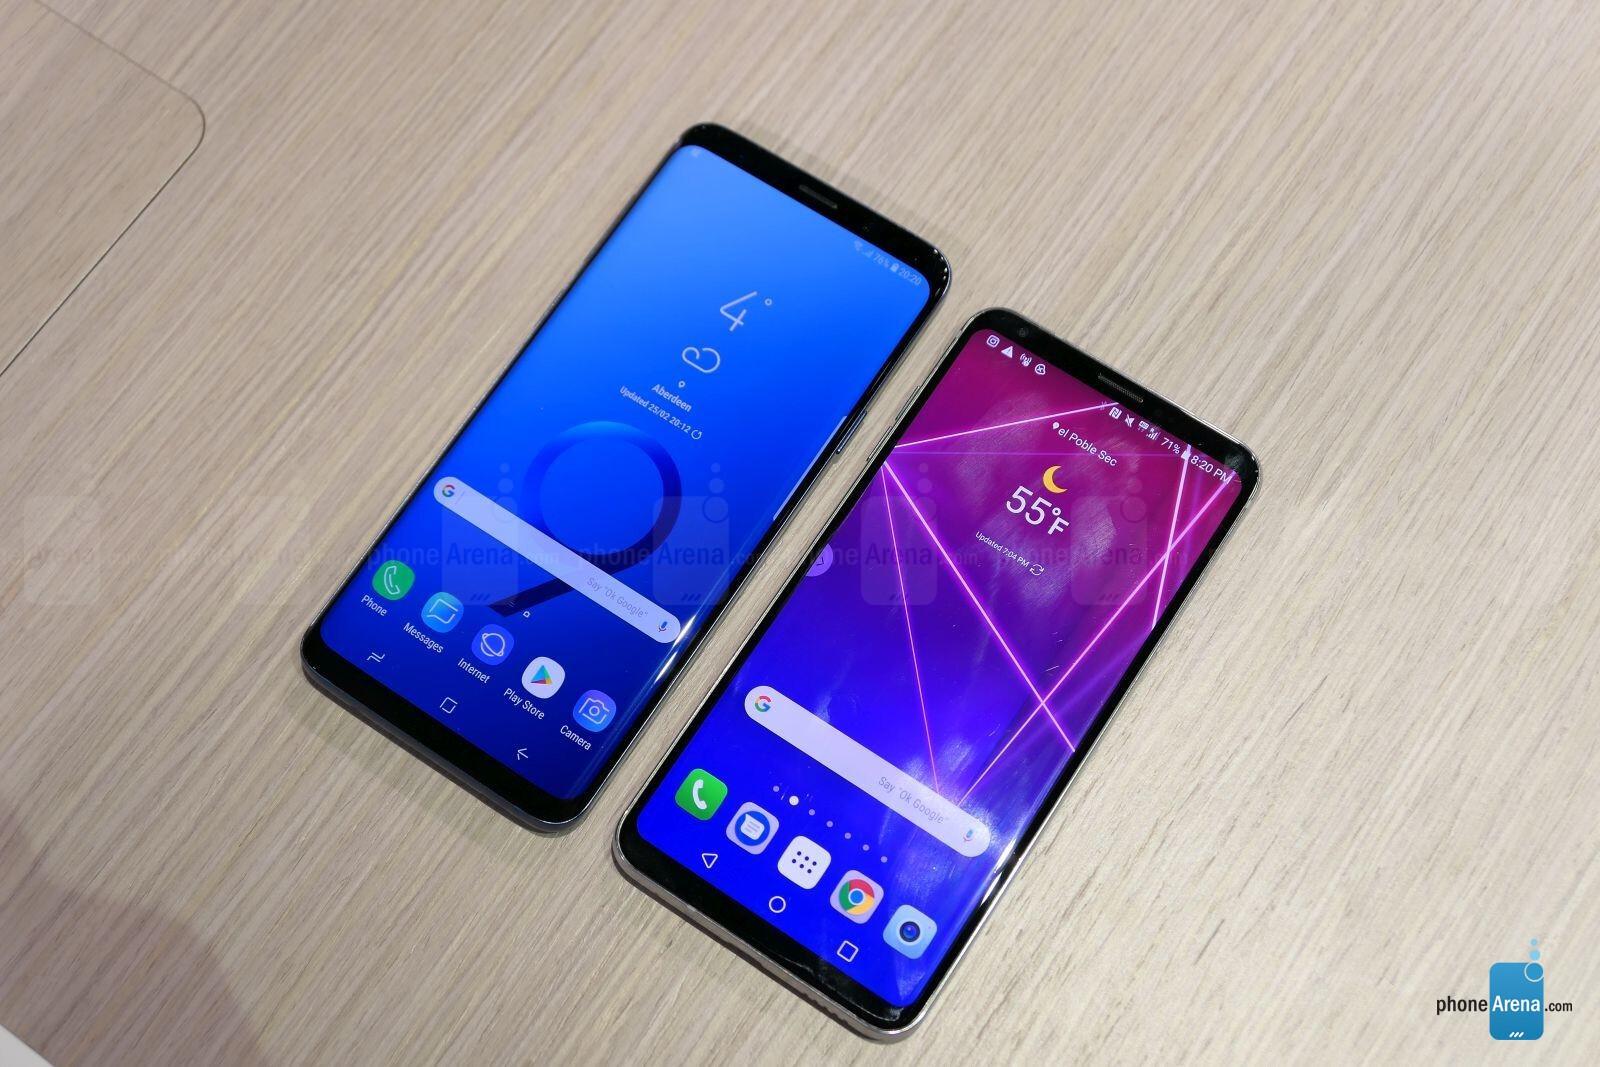 Samsung Galaxy S9+ vs LG V30: first look | PhoneArena